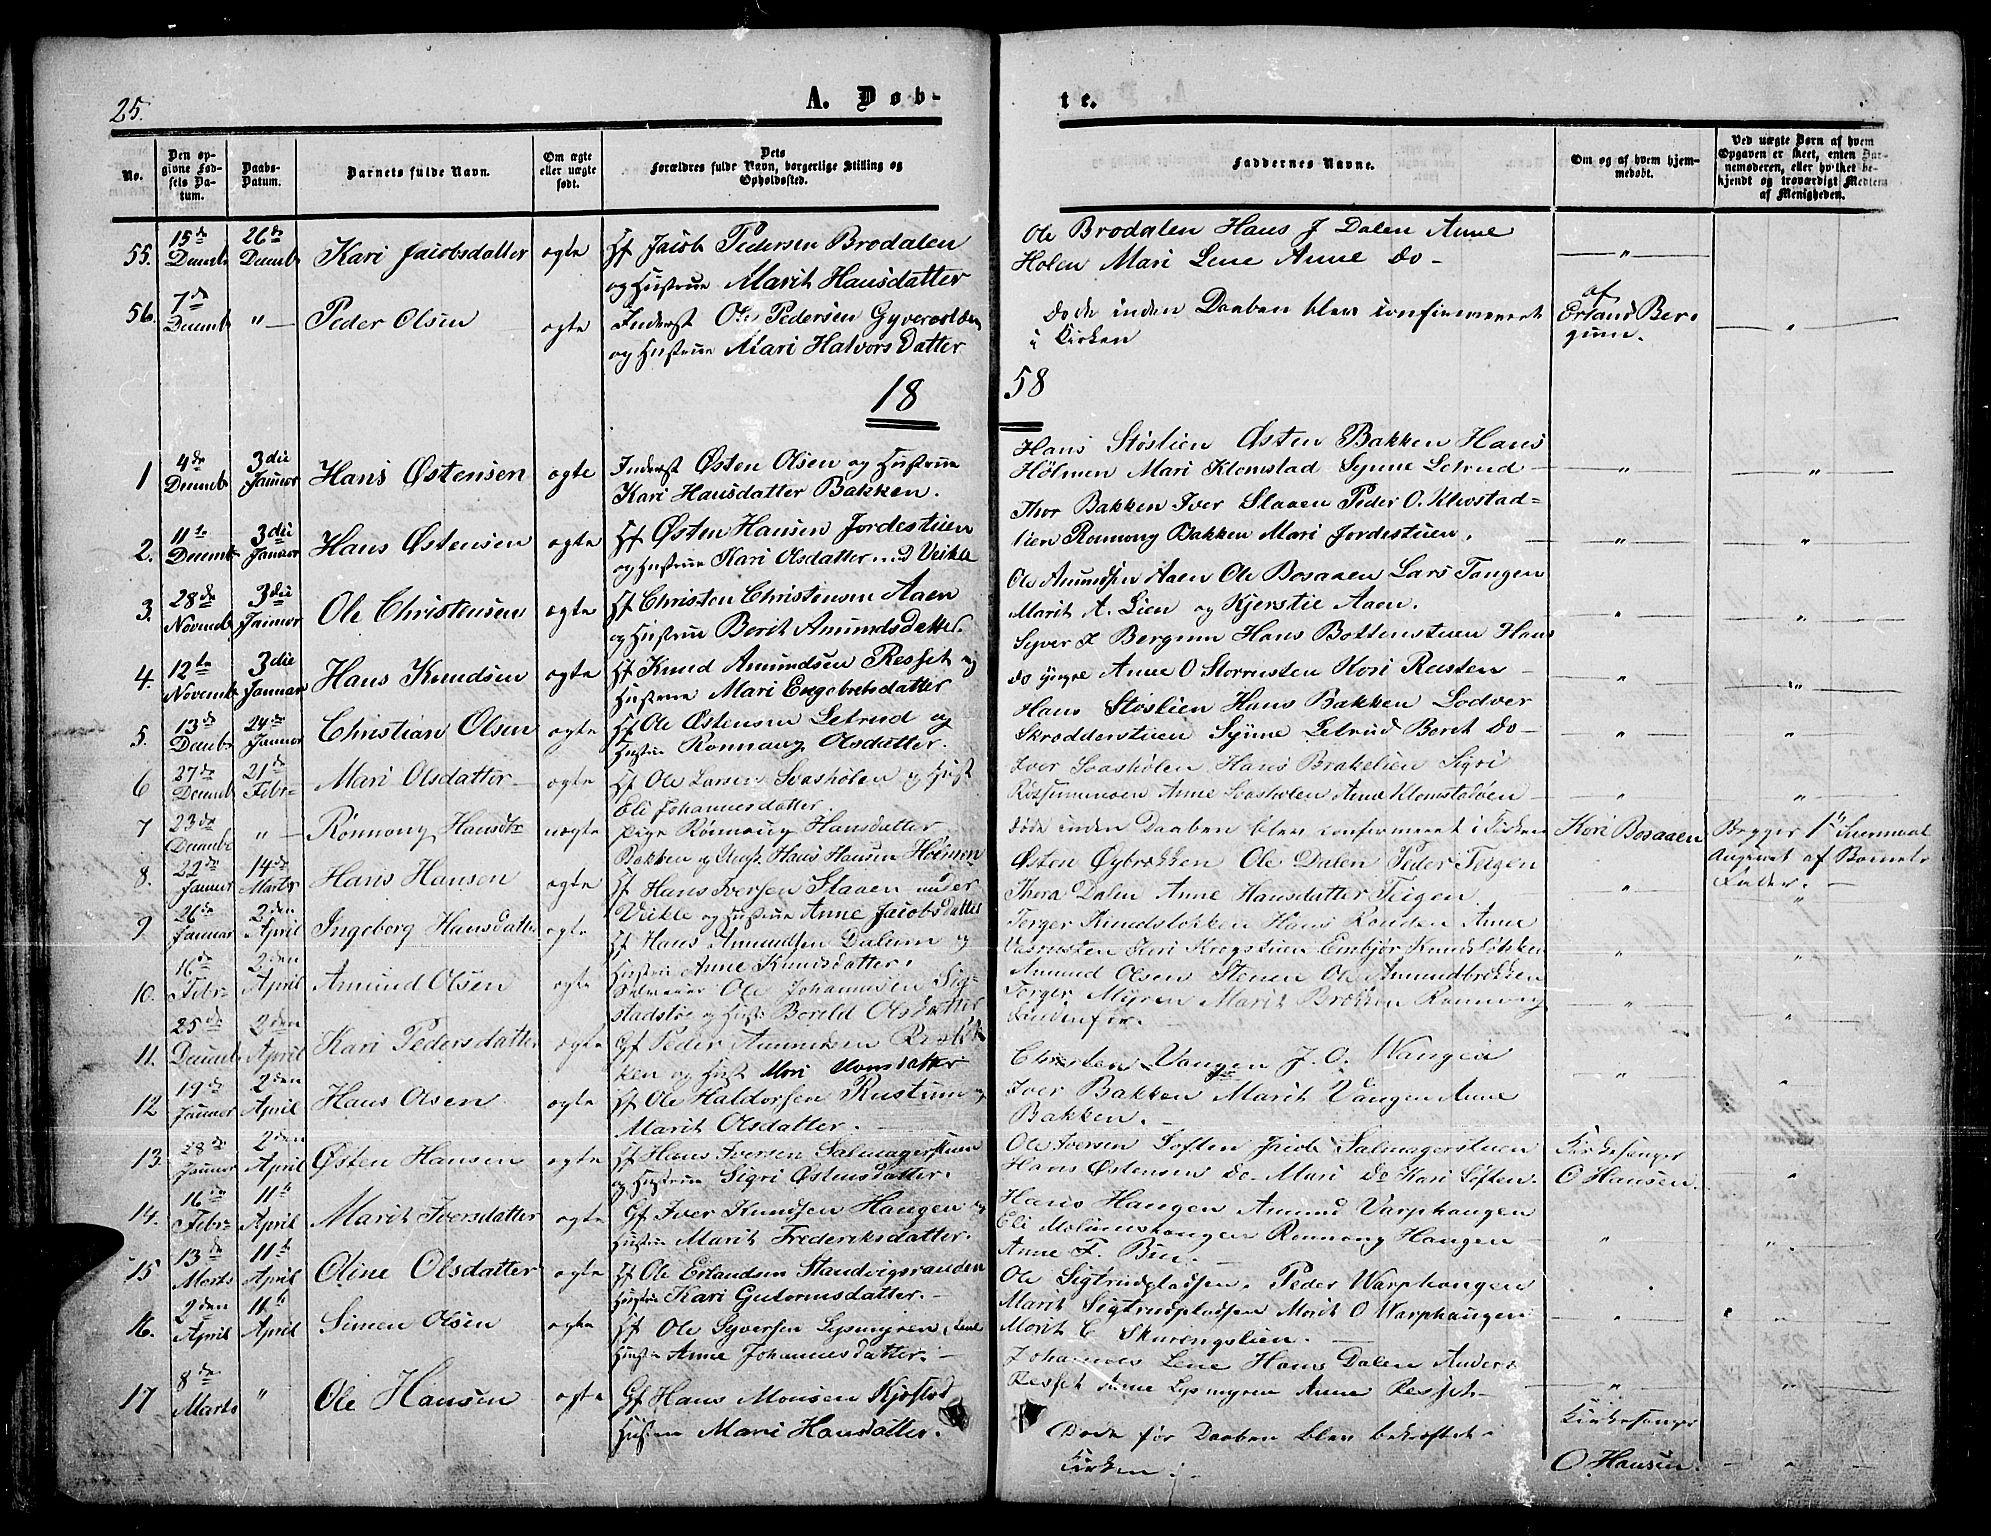 SAH, Nord-Fron prestekontor, Klokkerbok nr. 3, 1851-1886, s. 25